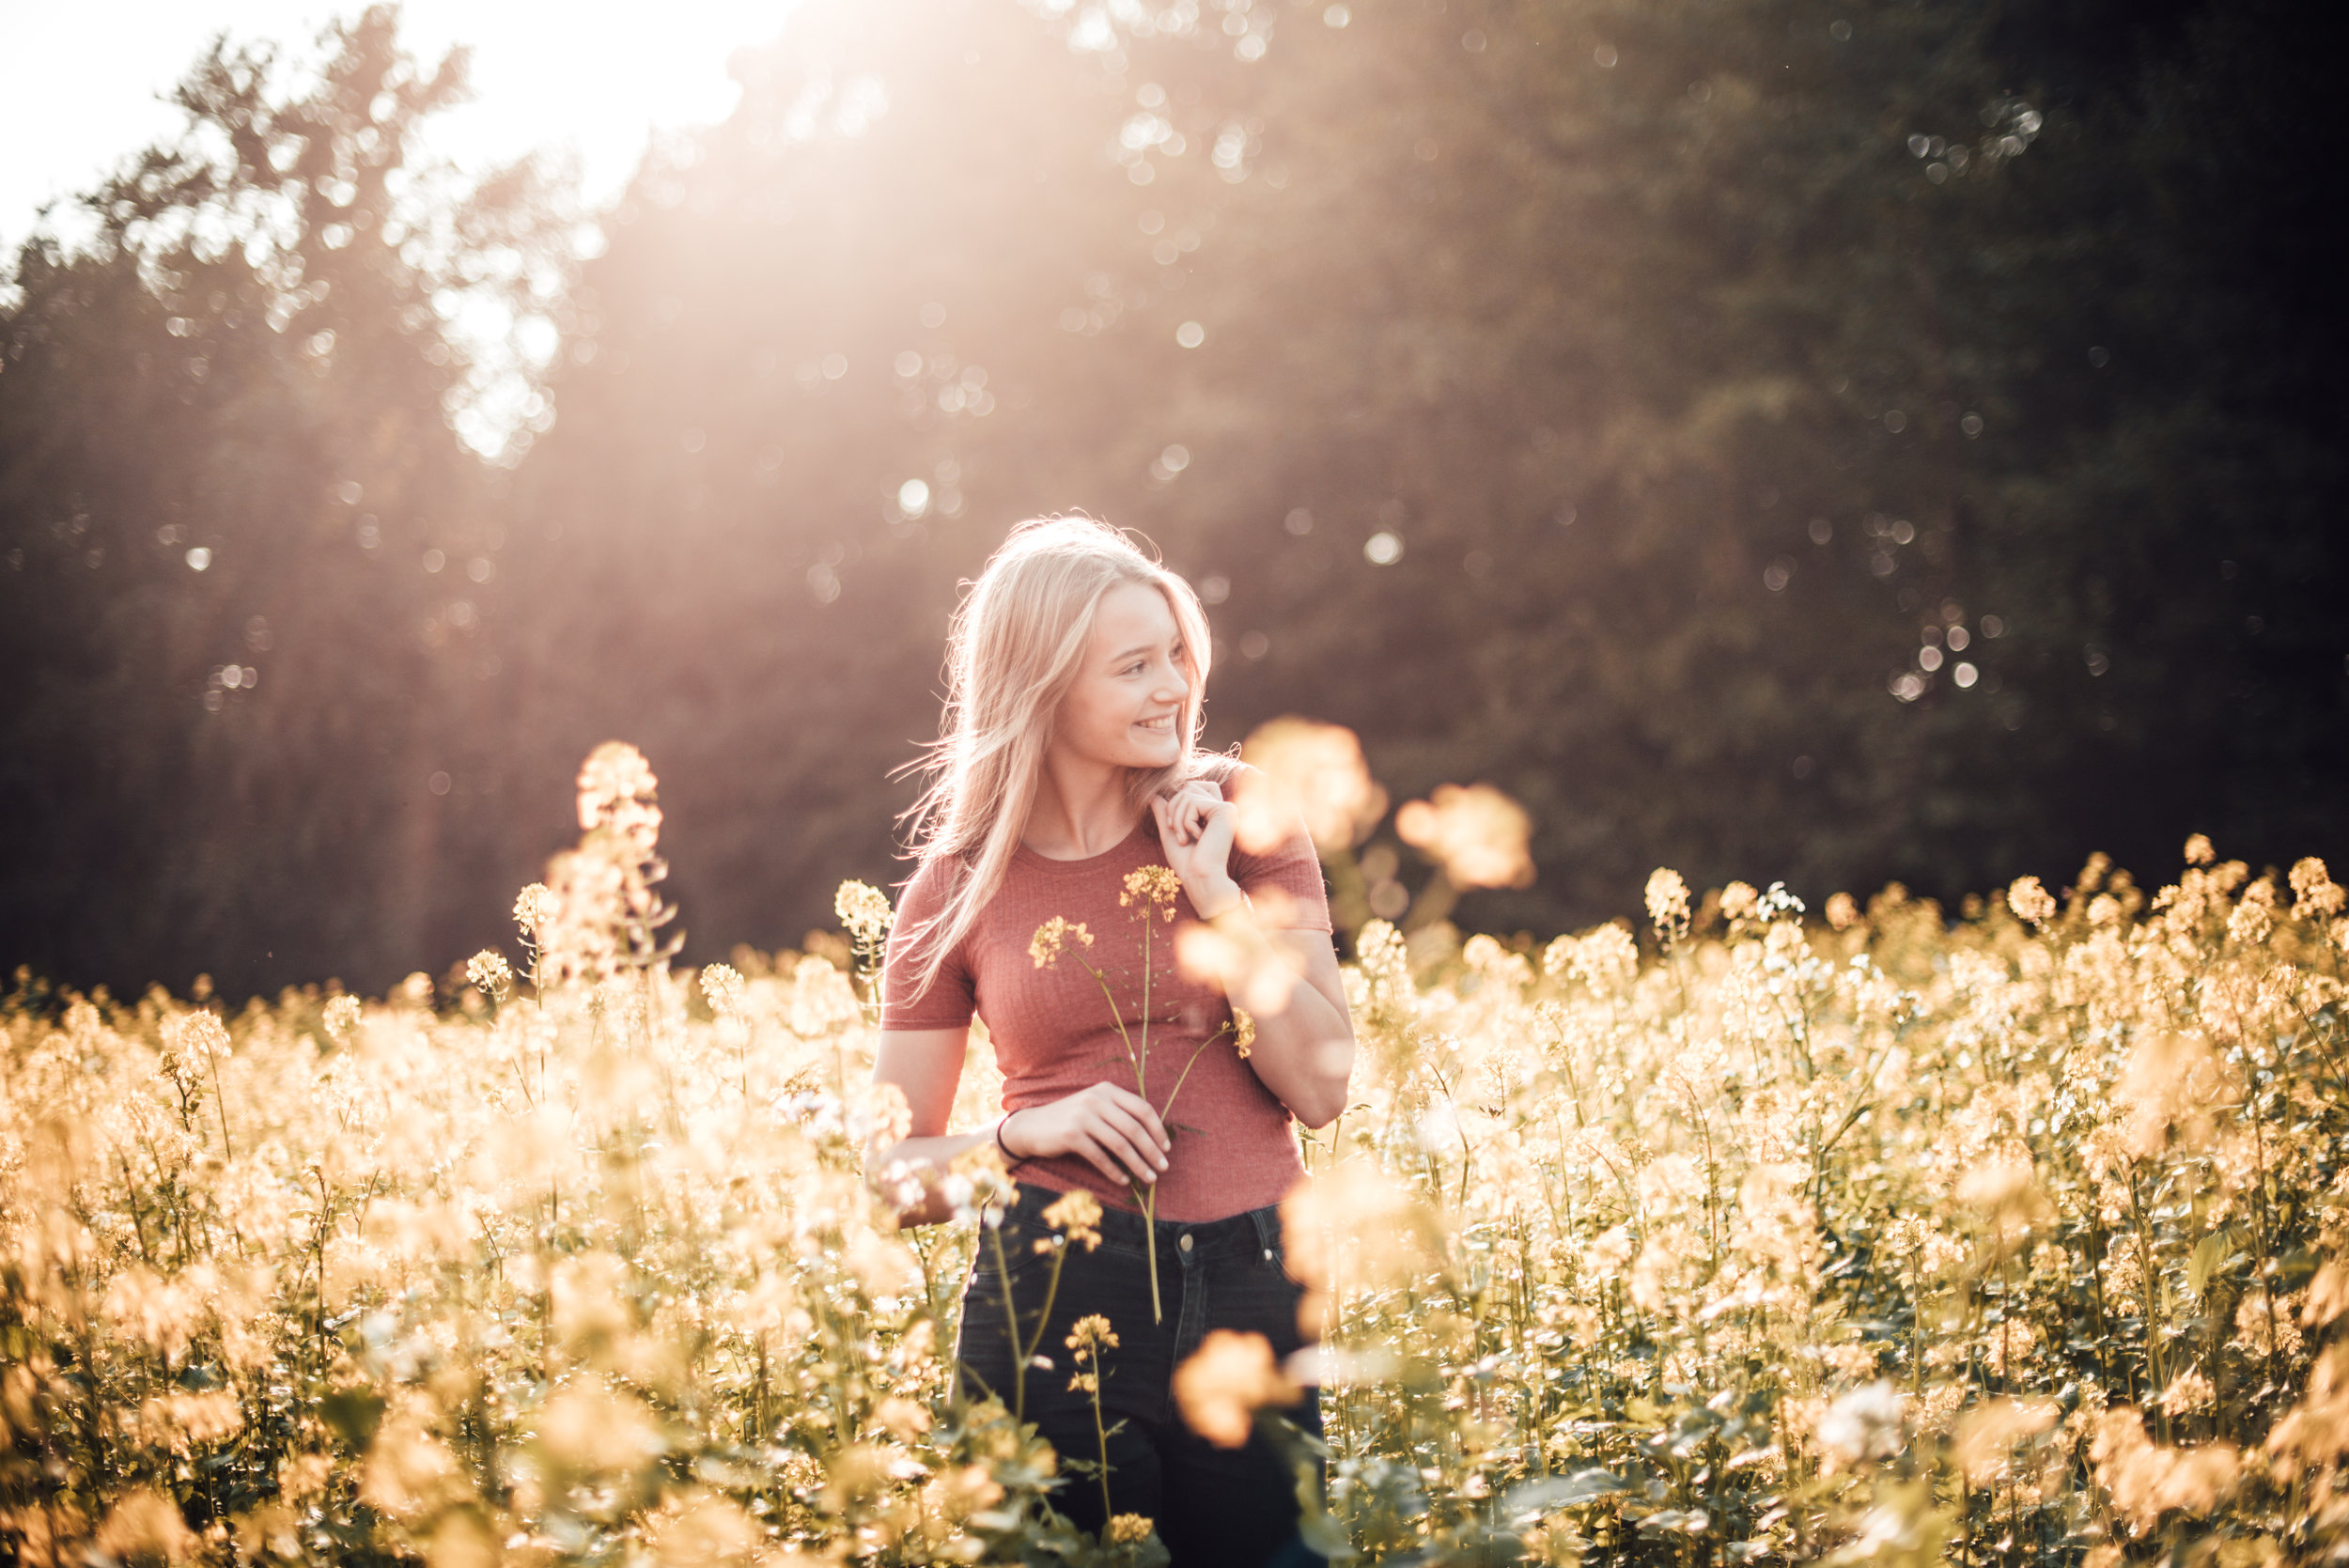 goldenhour-shooting-sunset-gretacaptures-photography